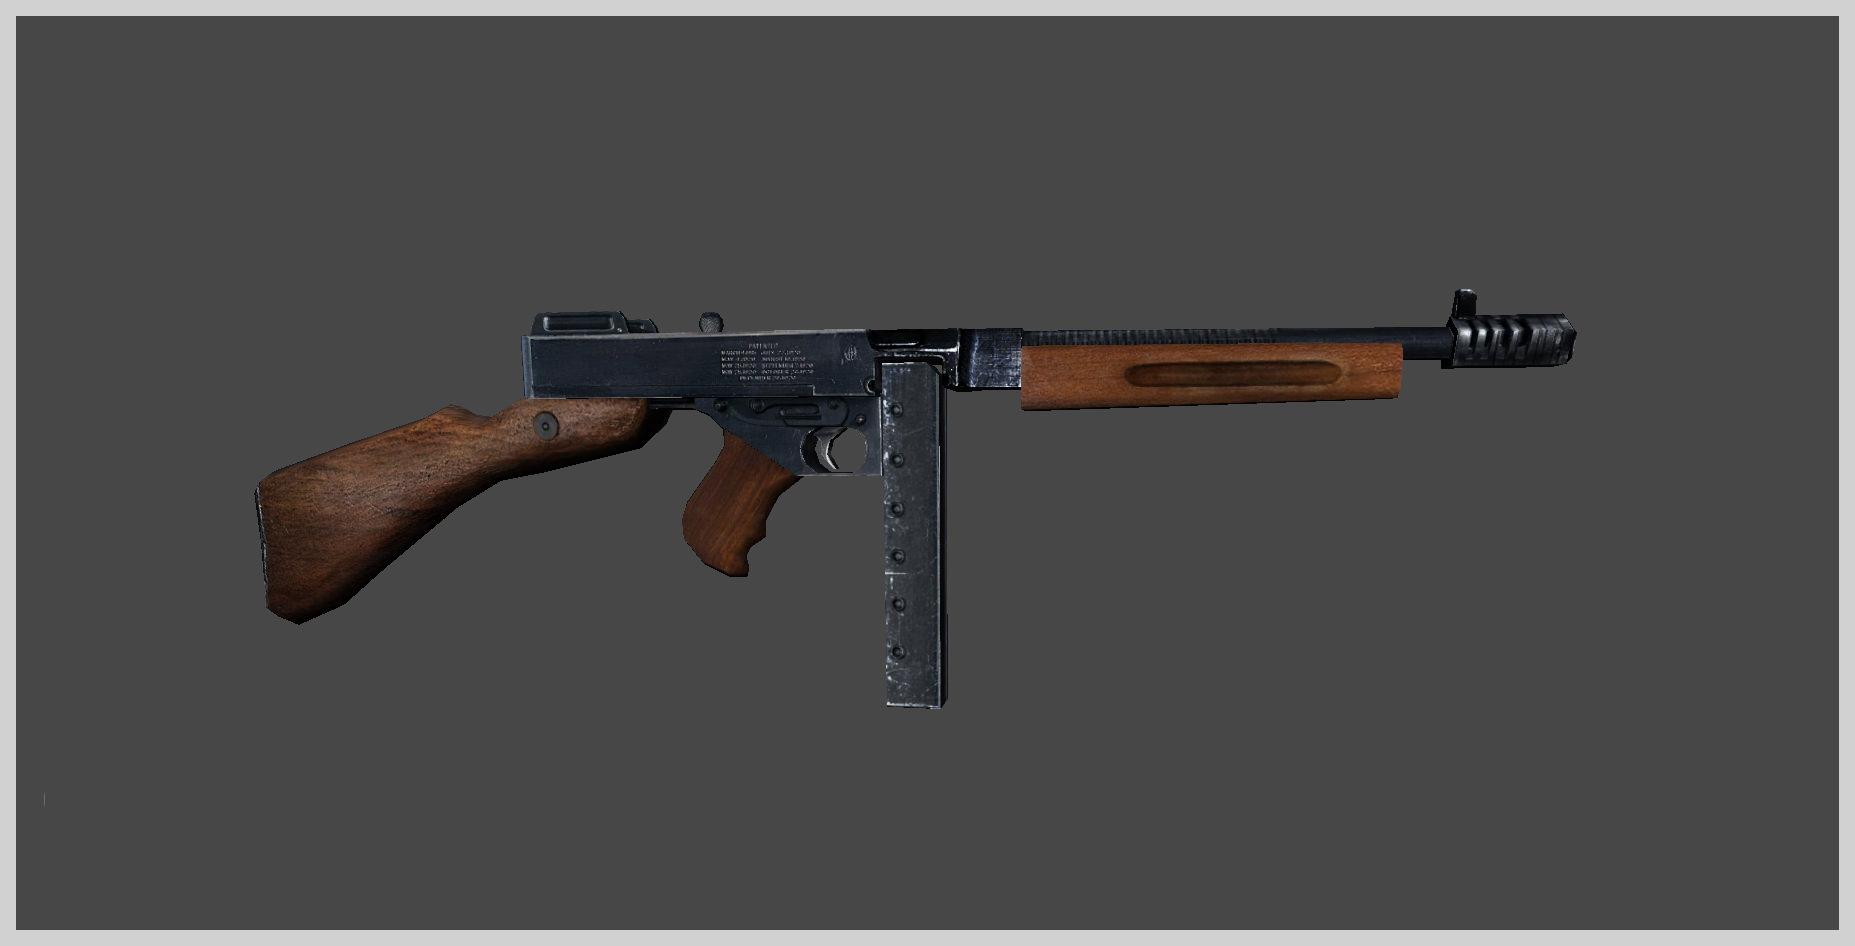 6455aee3aa0f ... thompson submachine gun 3d model low-poly max obj mtl fbx tga mat 8 ...